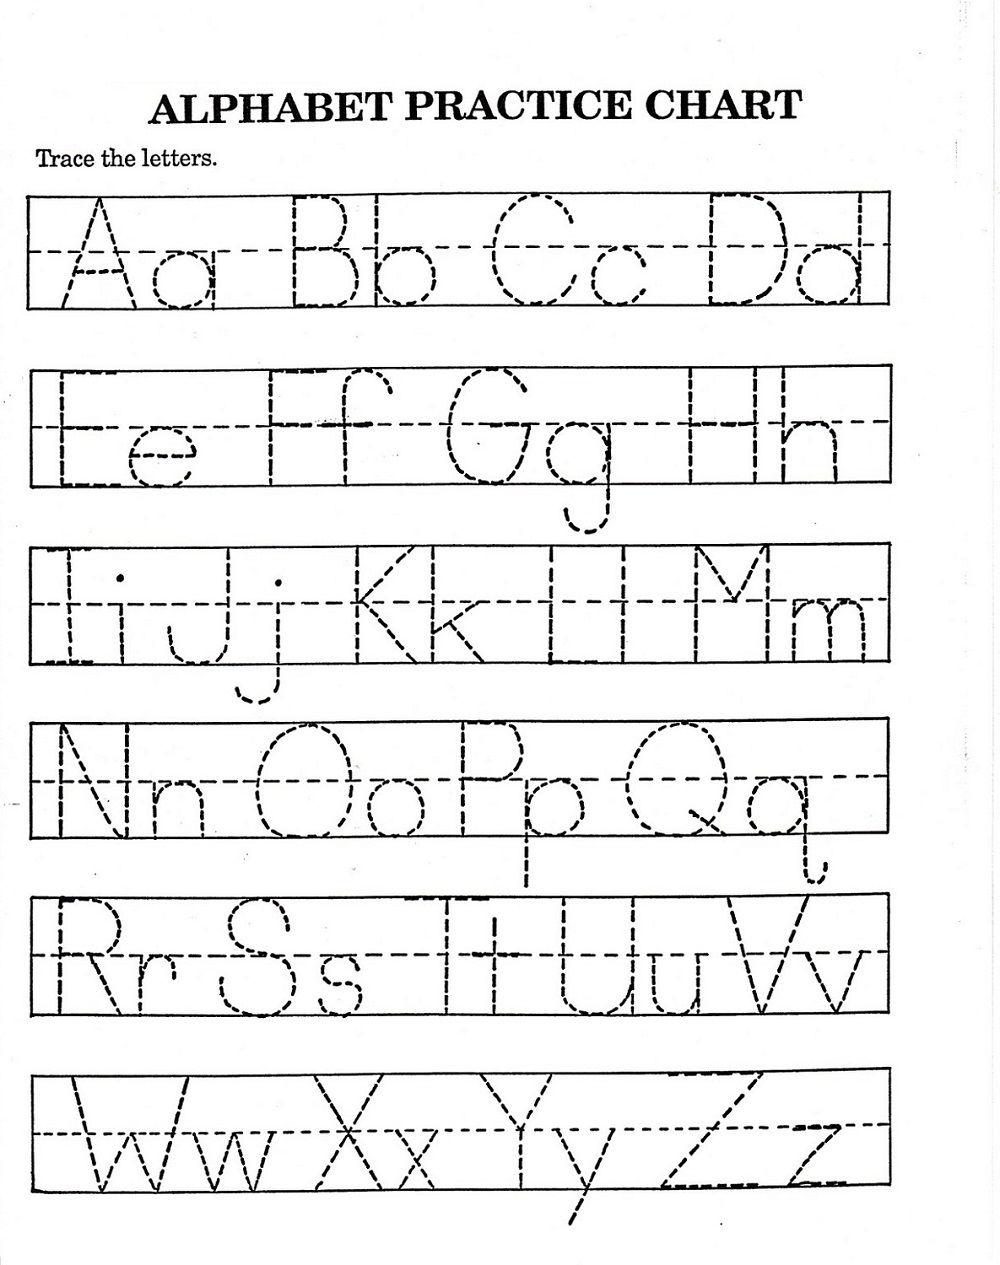 Az Worksheets For Kindergarten Traceable Alphabet Z Activity intended for Alphabet Handwriting Worksheets A To Z